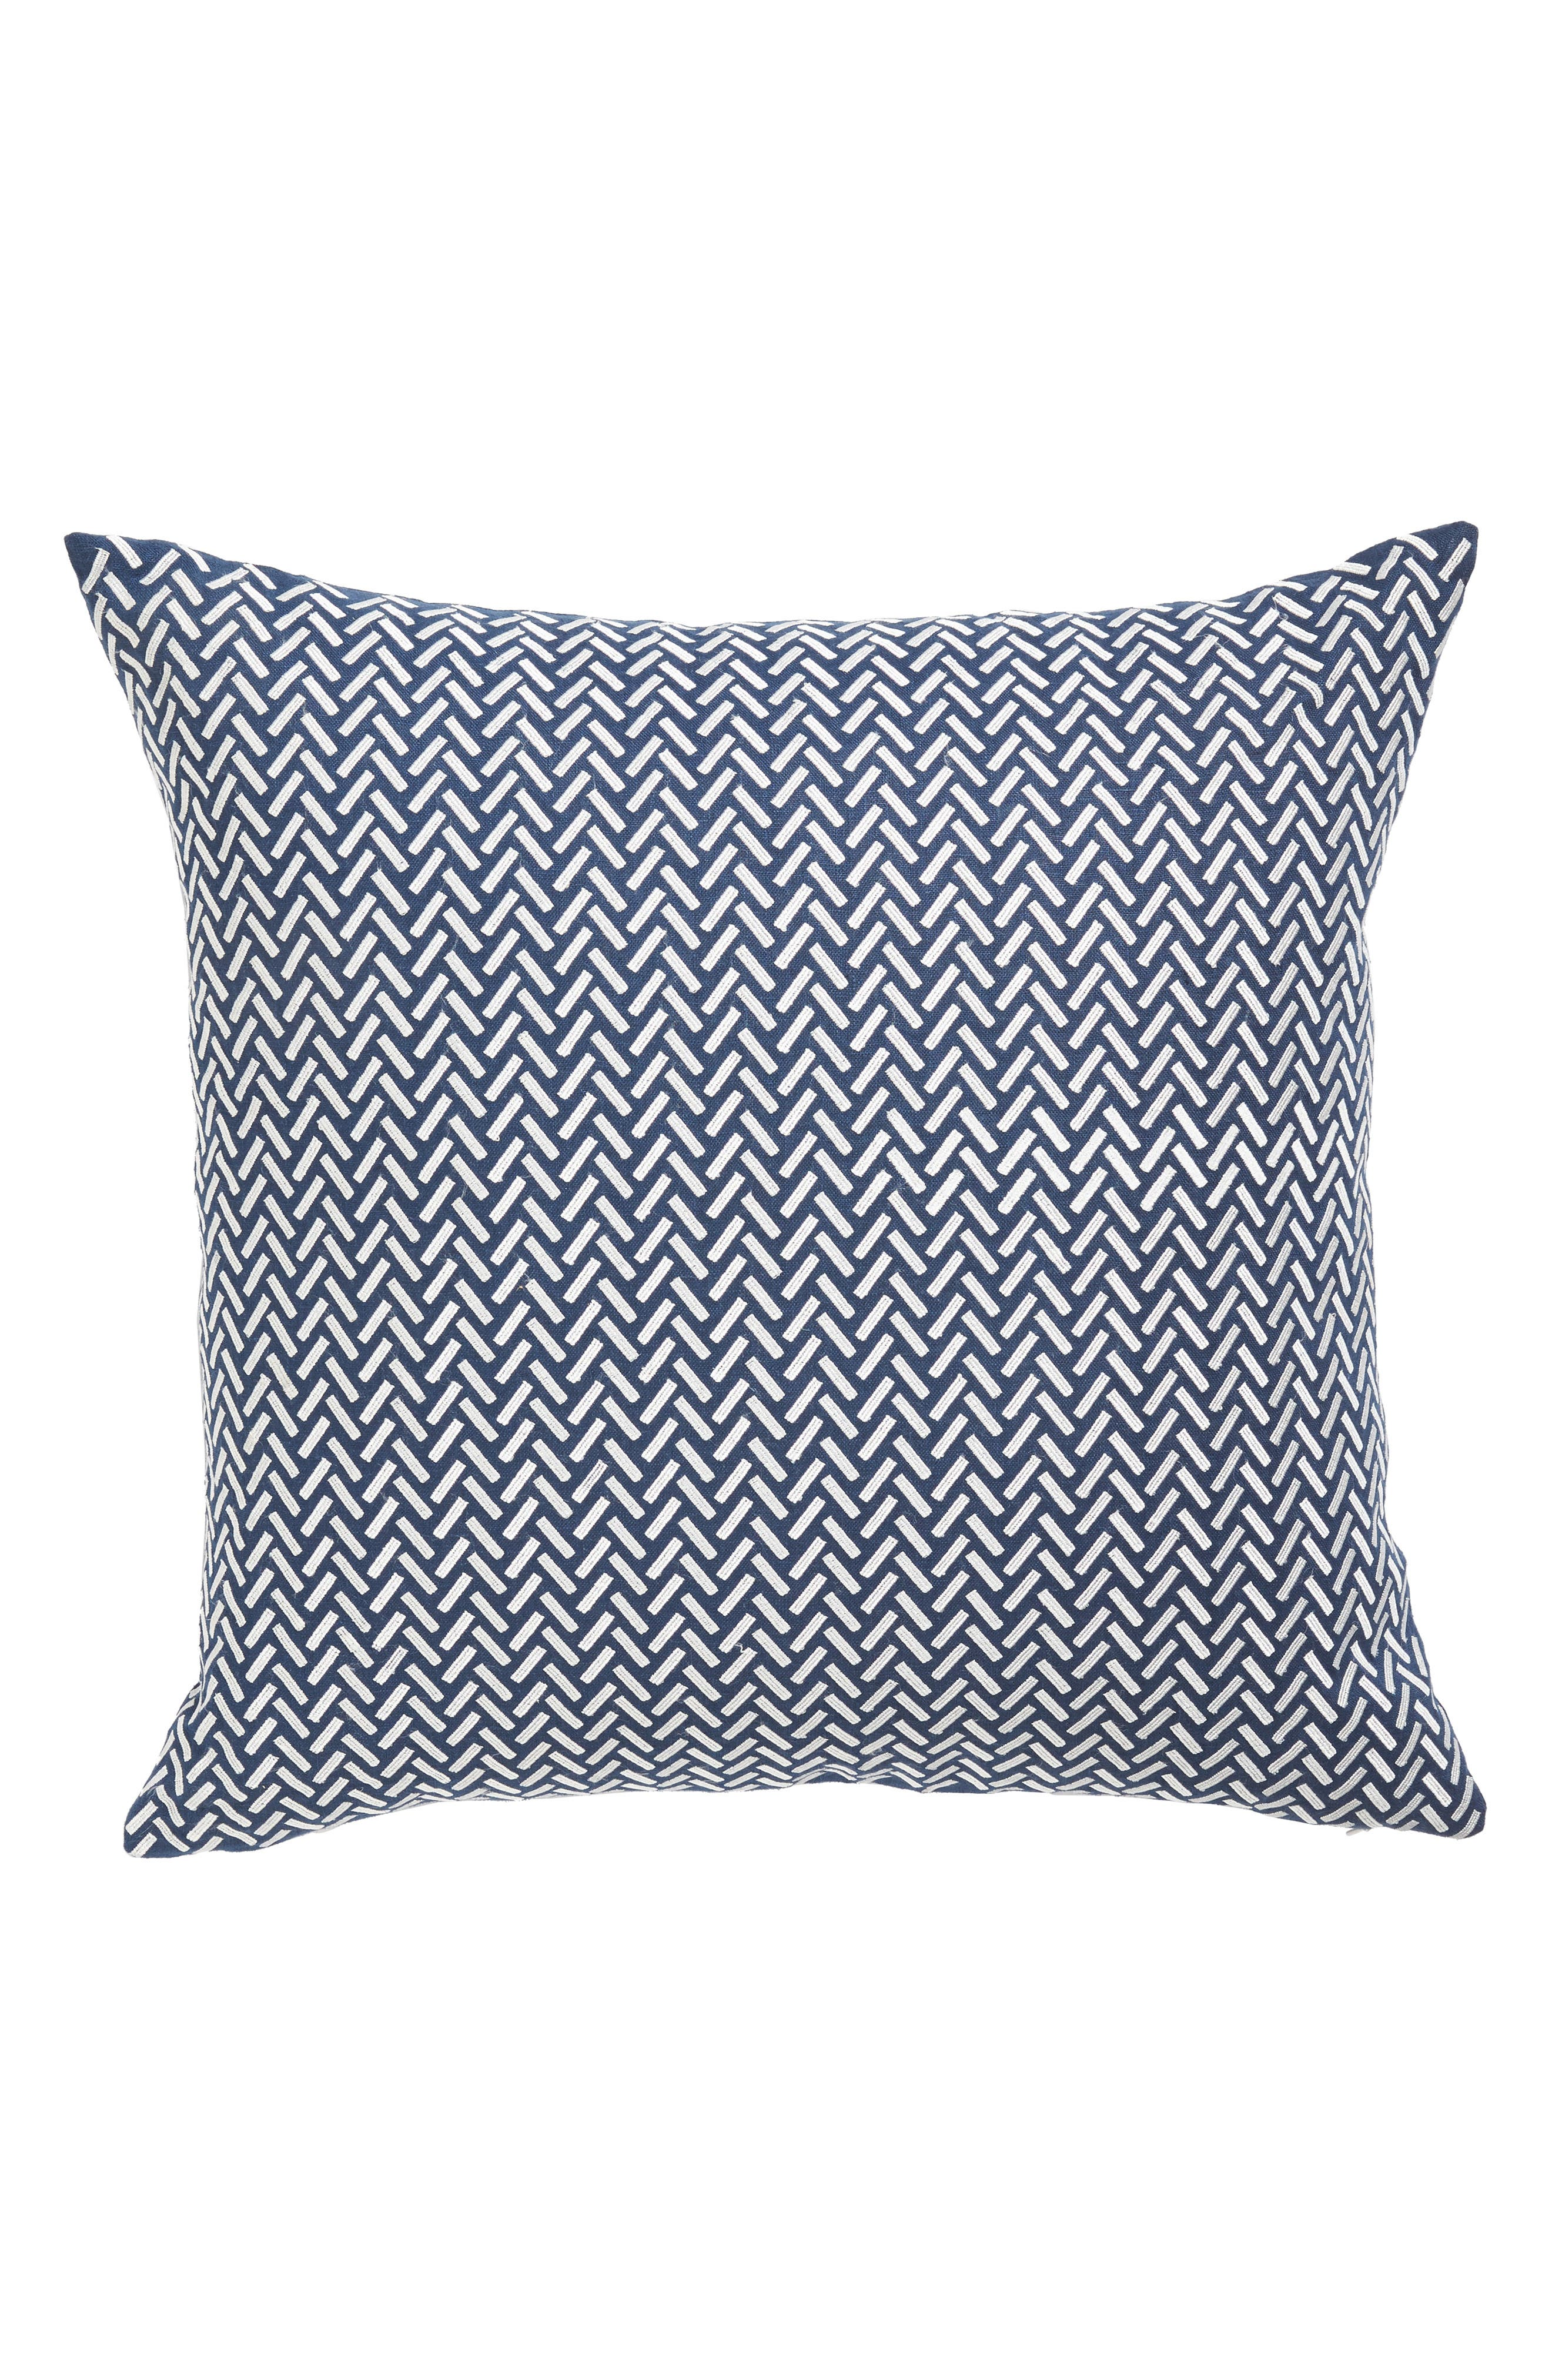 Corana Linen Pillow,                             Main thumbnail 1, color,                             NAVY/WHITE